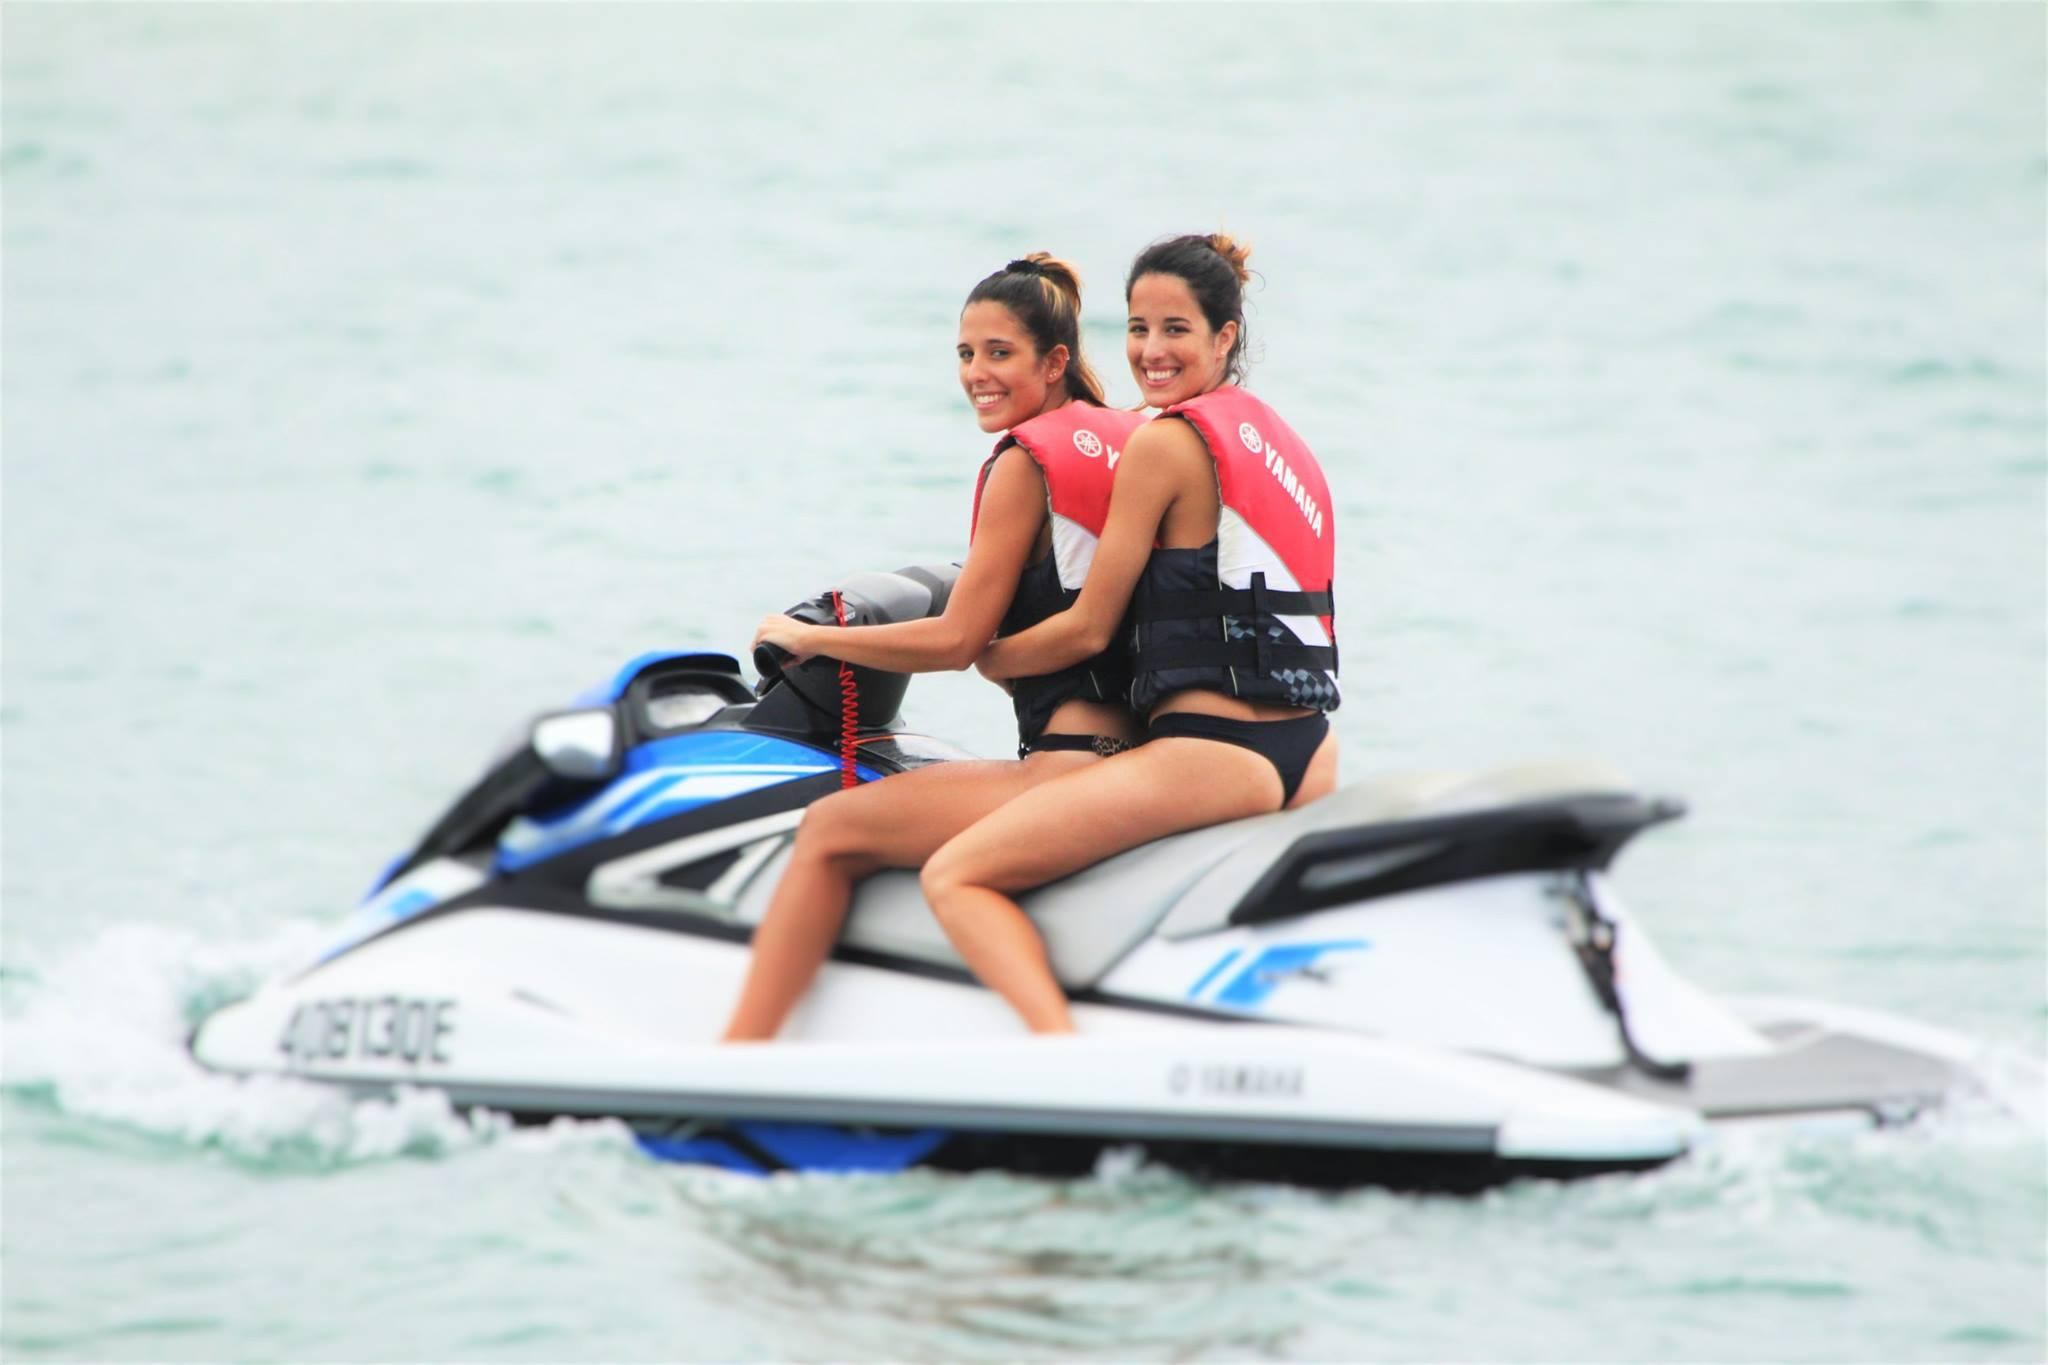 Moto d'acqua a Main Beach - Gold Coast